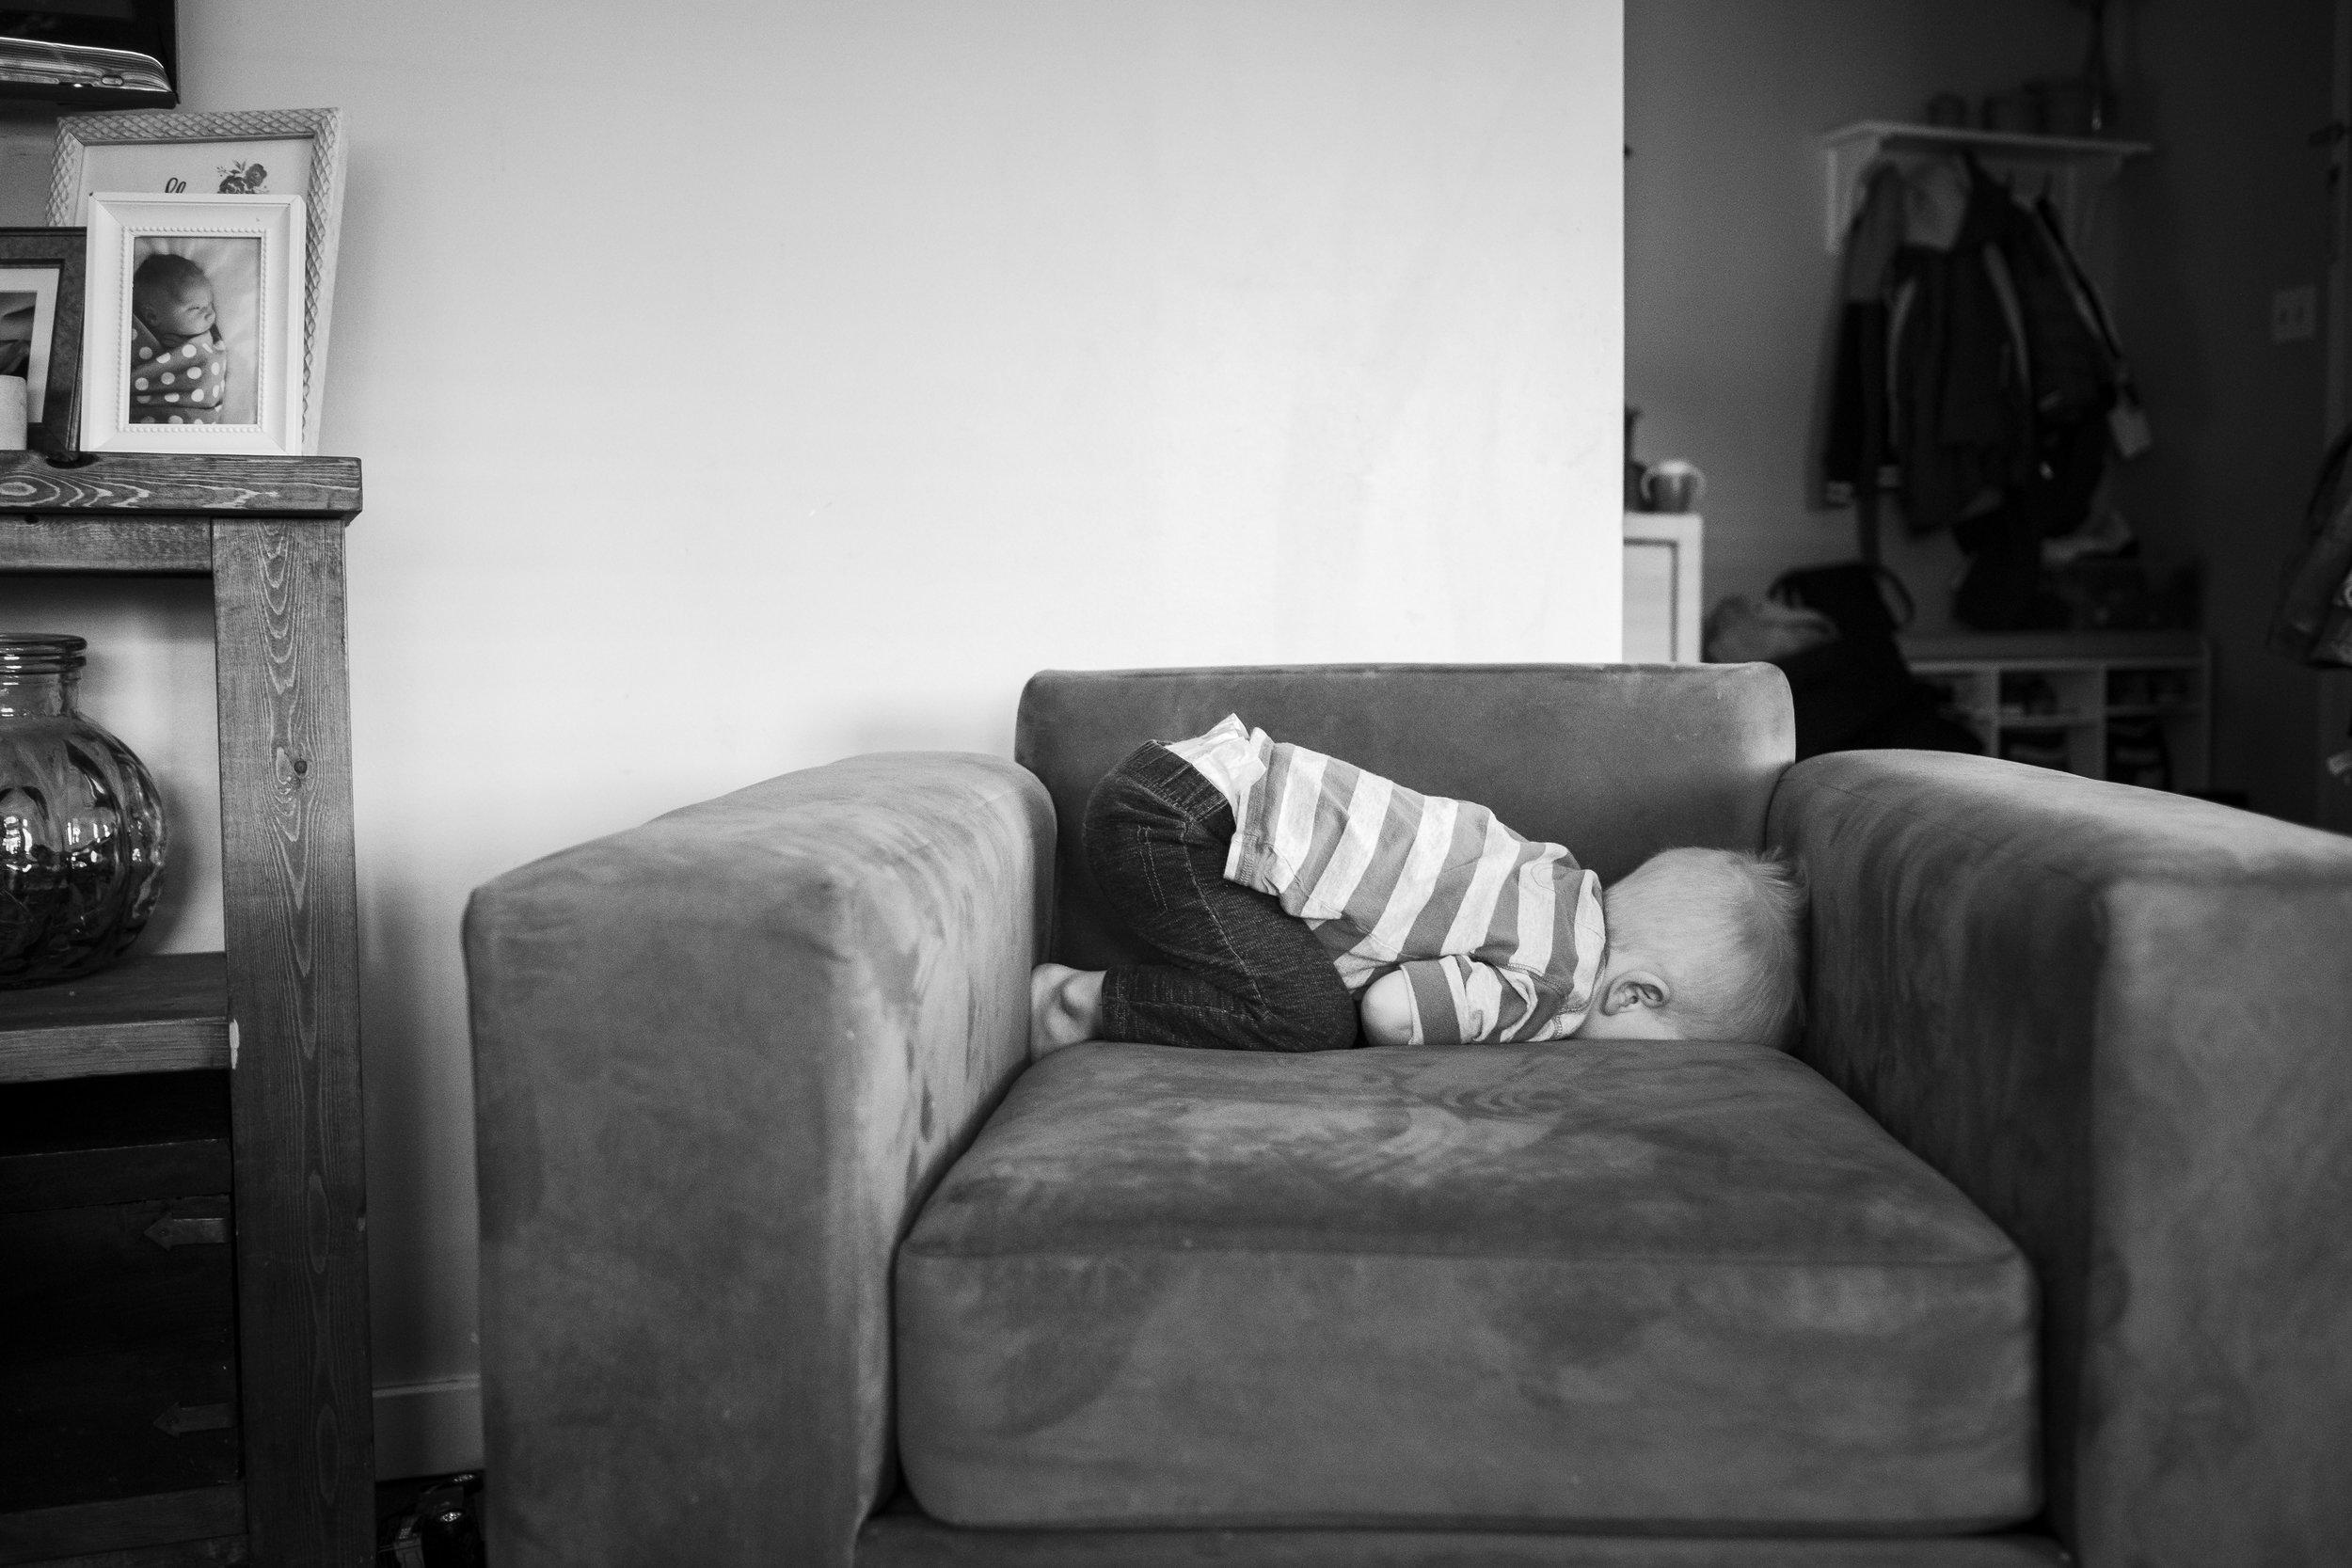 toddler-hiding-chair